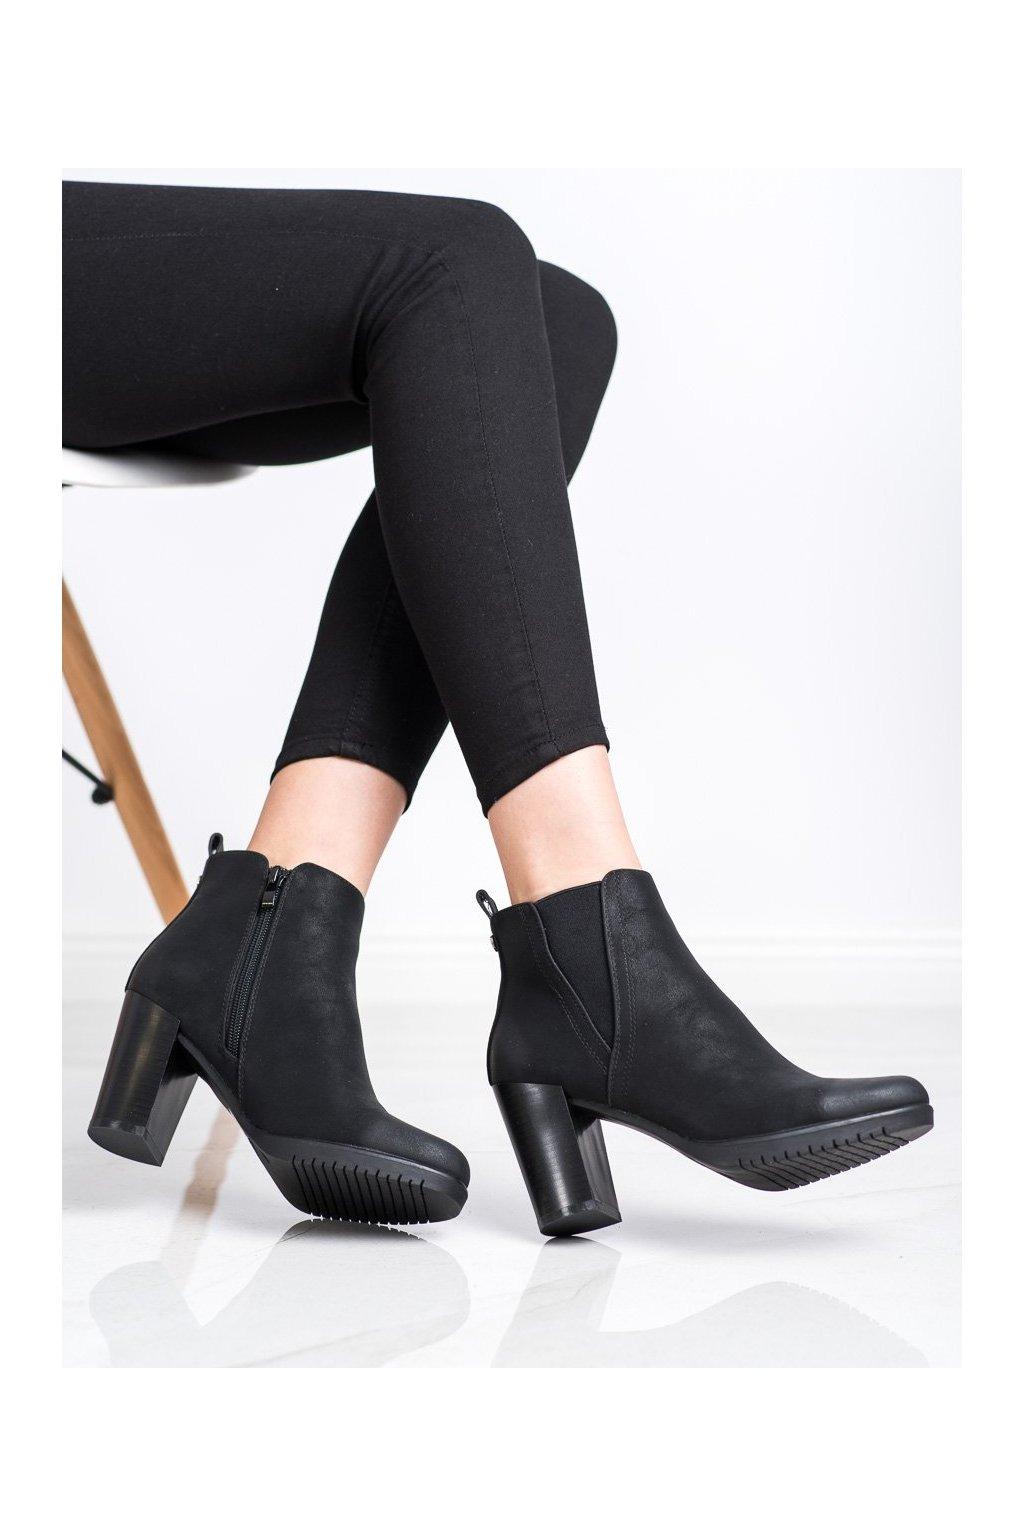 Čierne dámske topánky Sergio leone kod BT311B